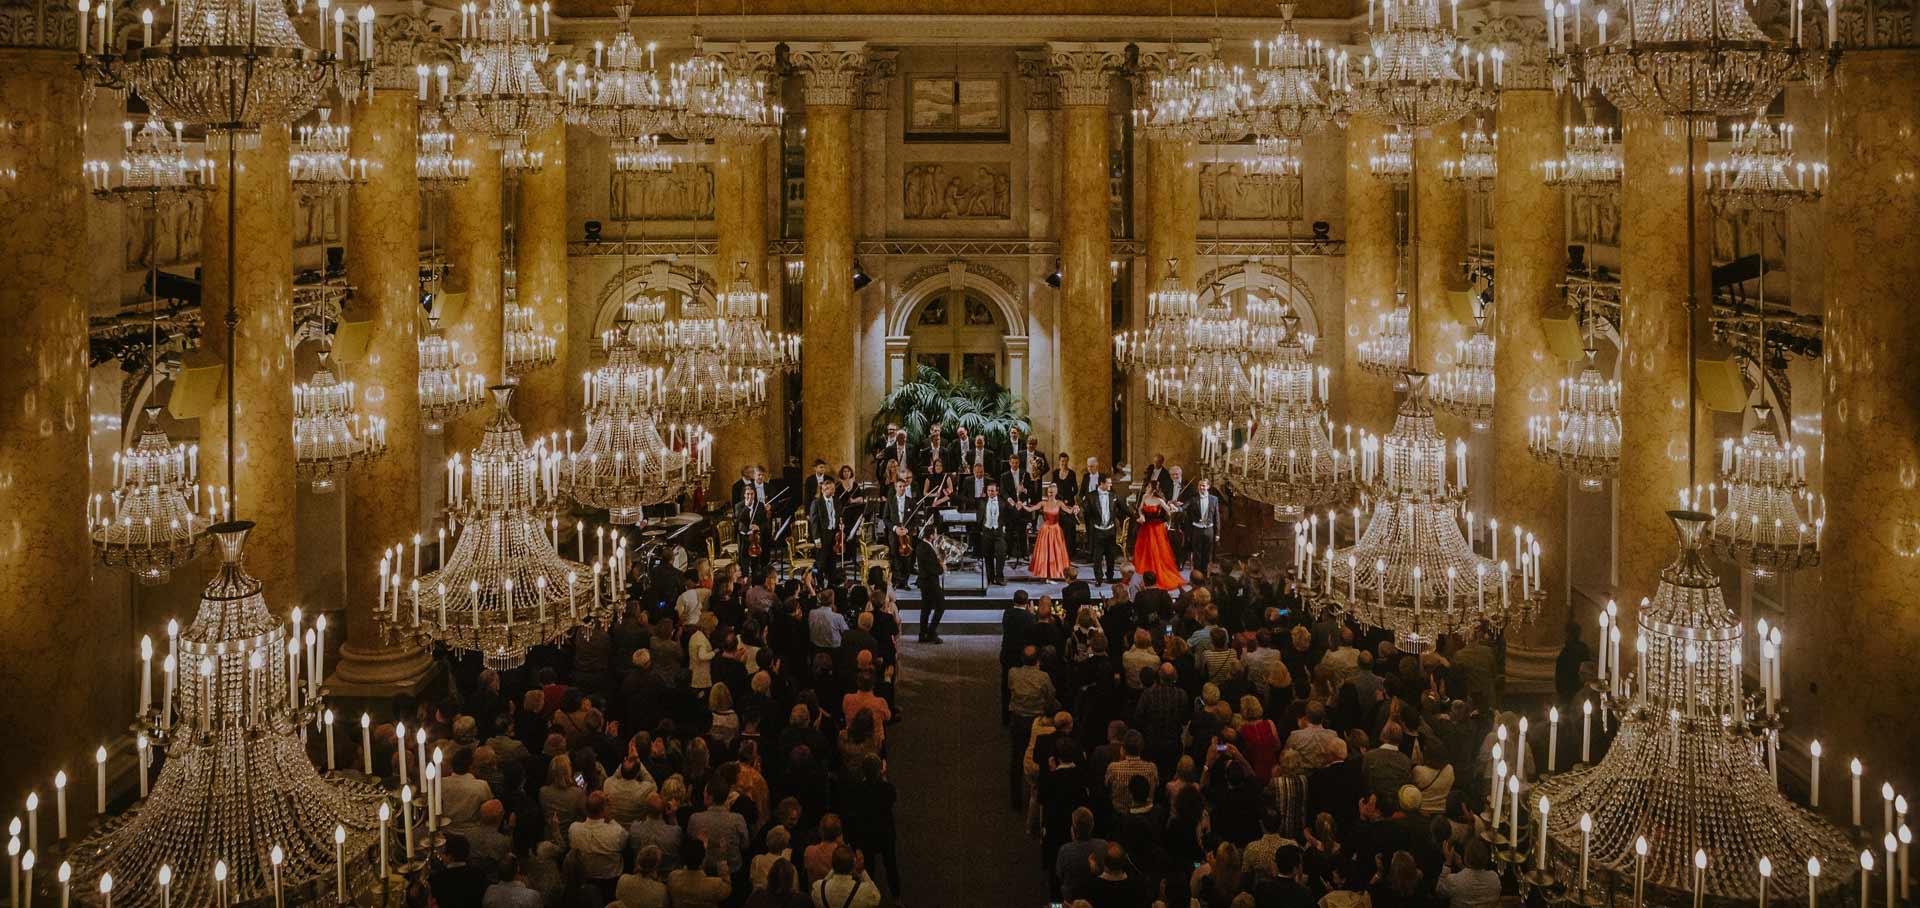 Wiener Hofburgorchester klassische Konzerte und klassische Musik